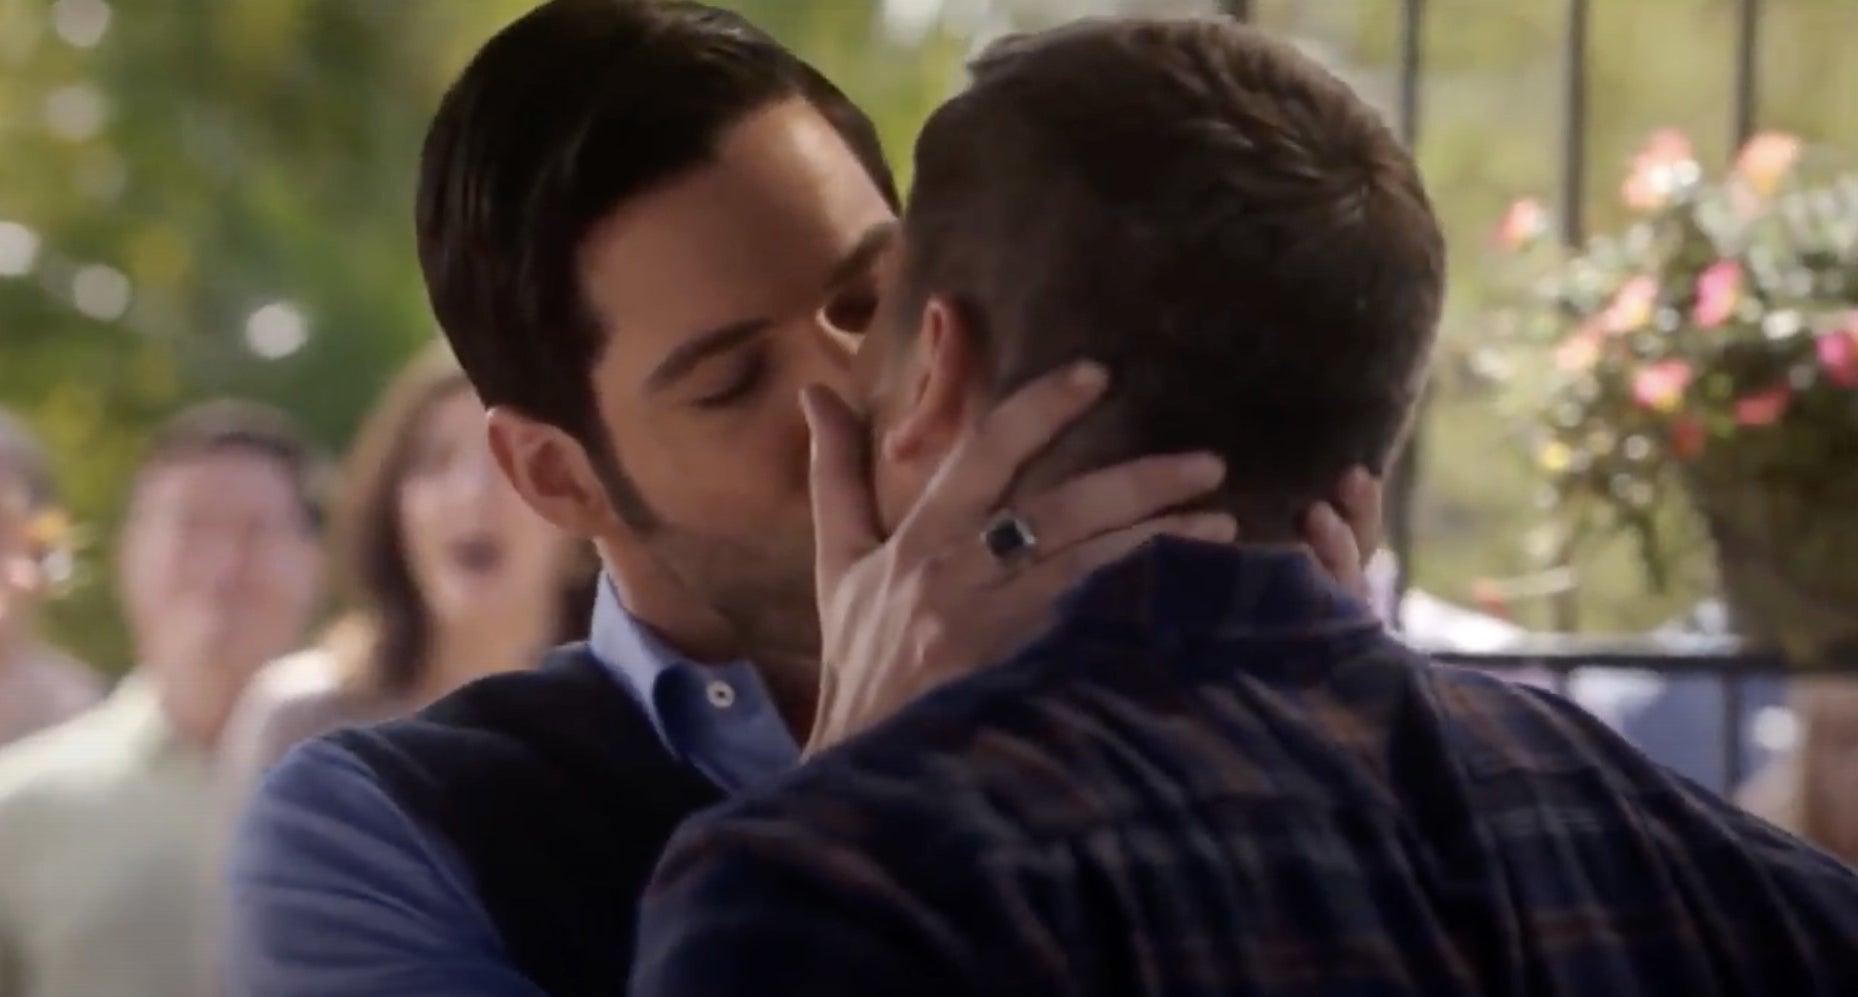 Lucifer grabbing Pierce's face and kissing him